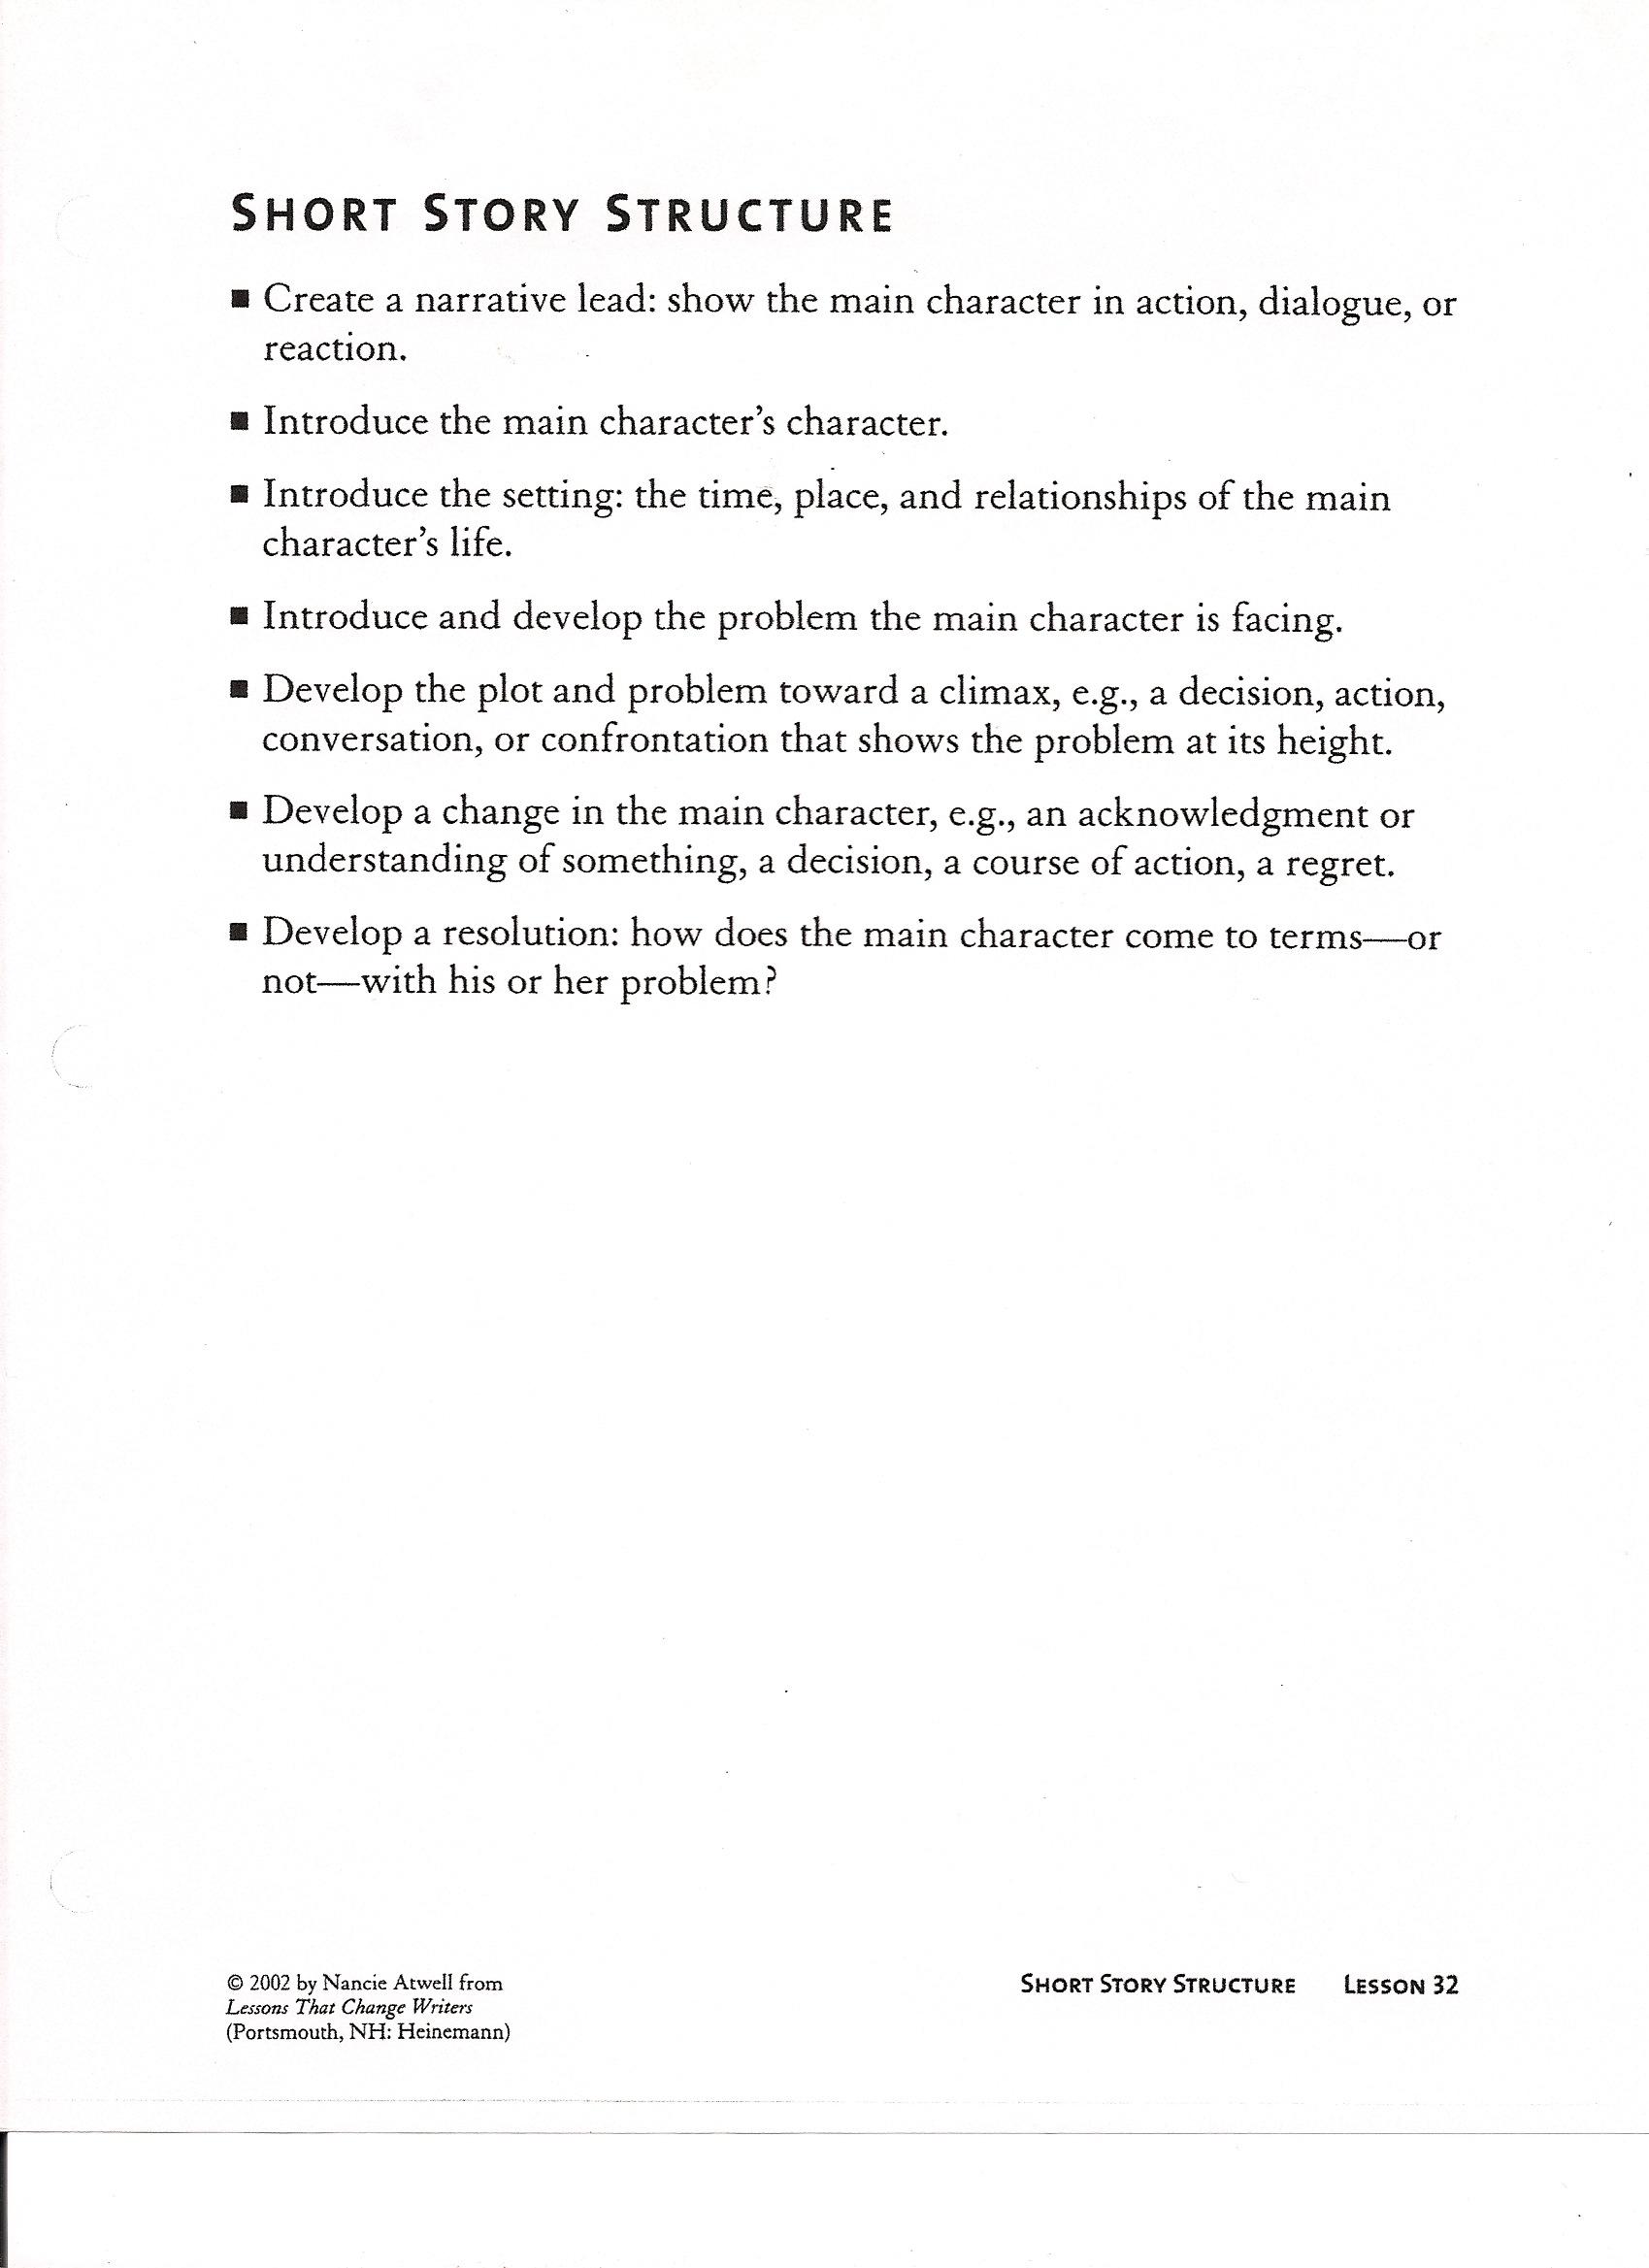 Buy Dissertation Online Writing Good Argumentative Essays